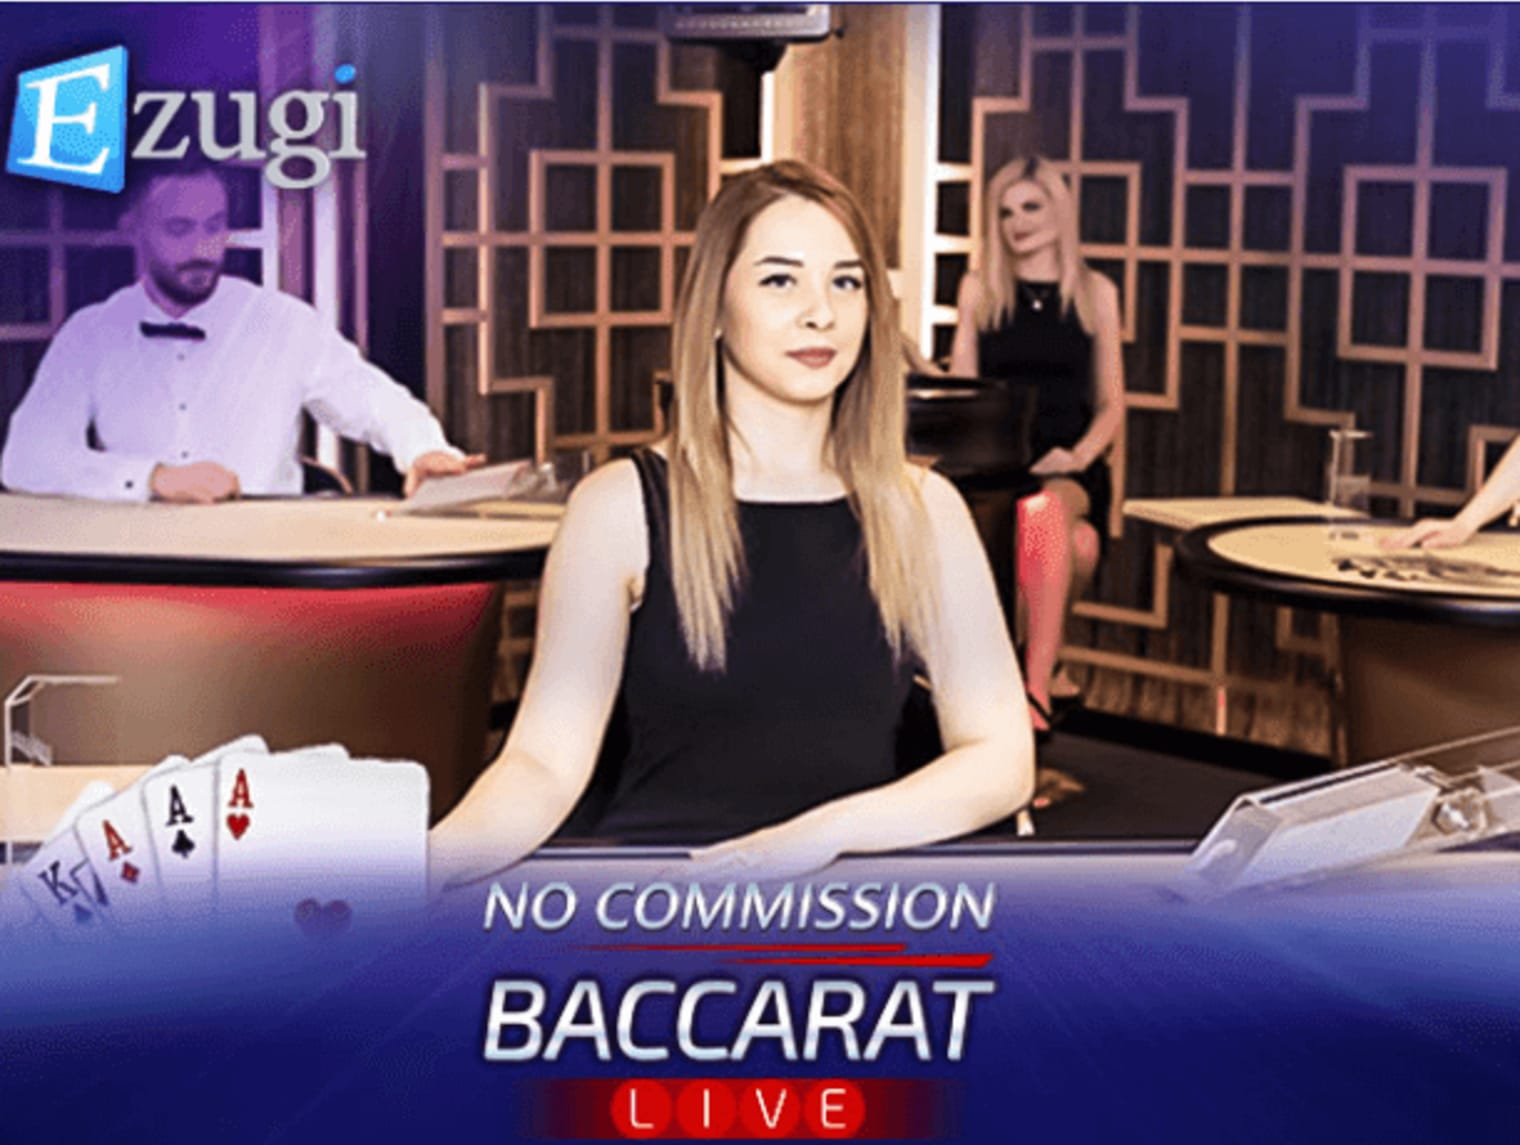 Ezugi No Commission Baccarat